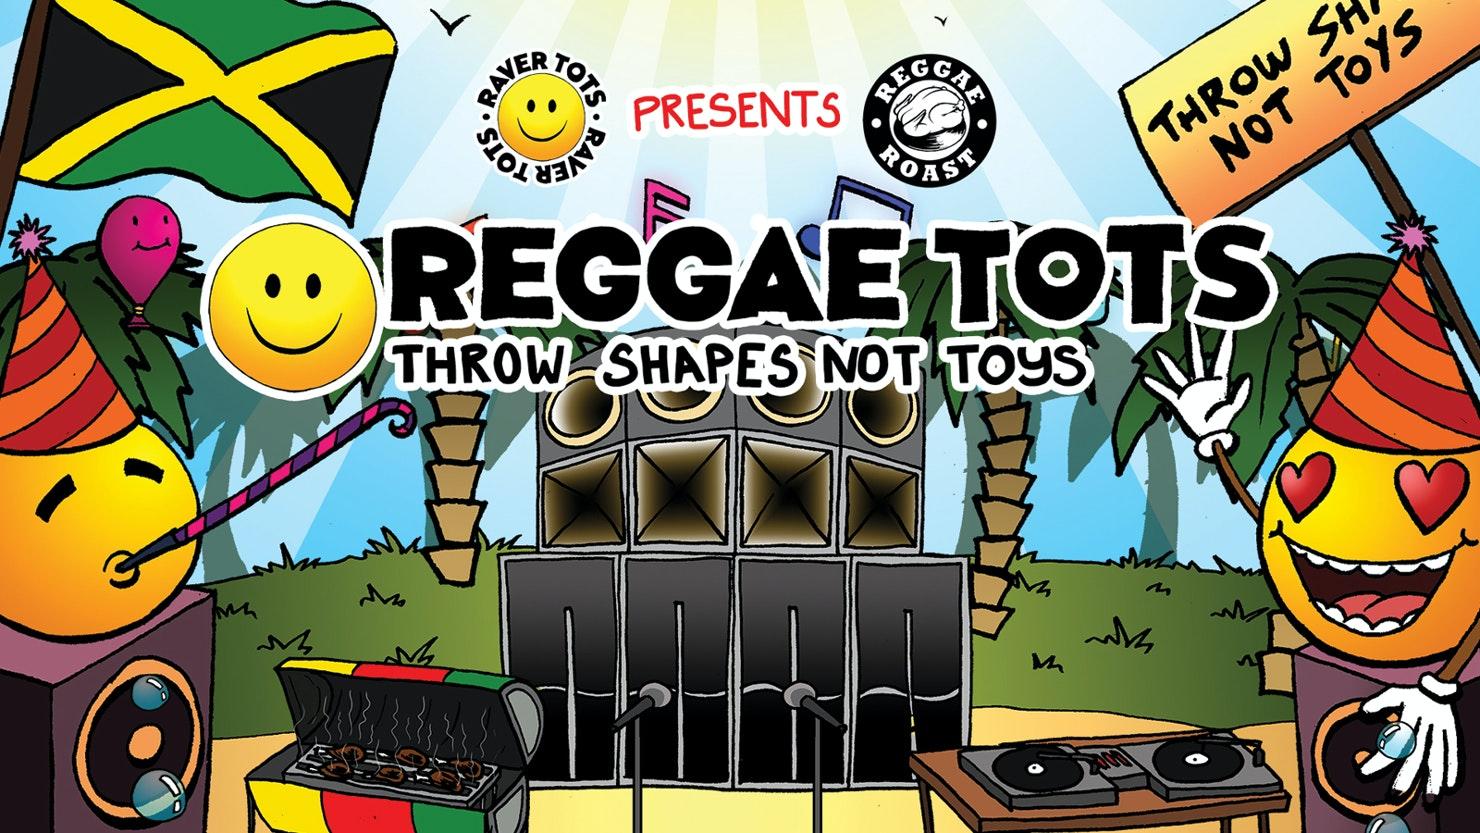 Reggae Roast x Raver Tots present Reggae Tots!